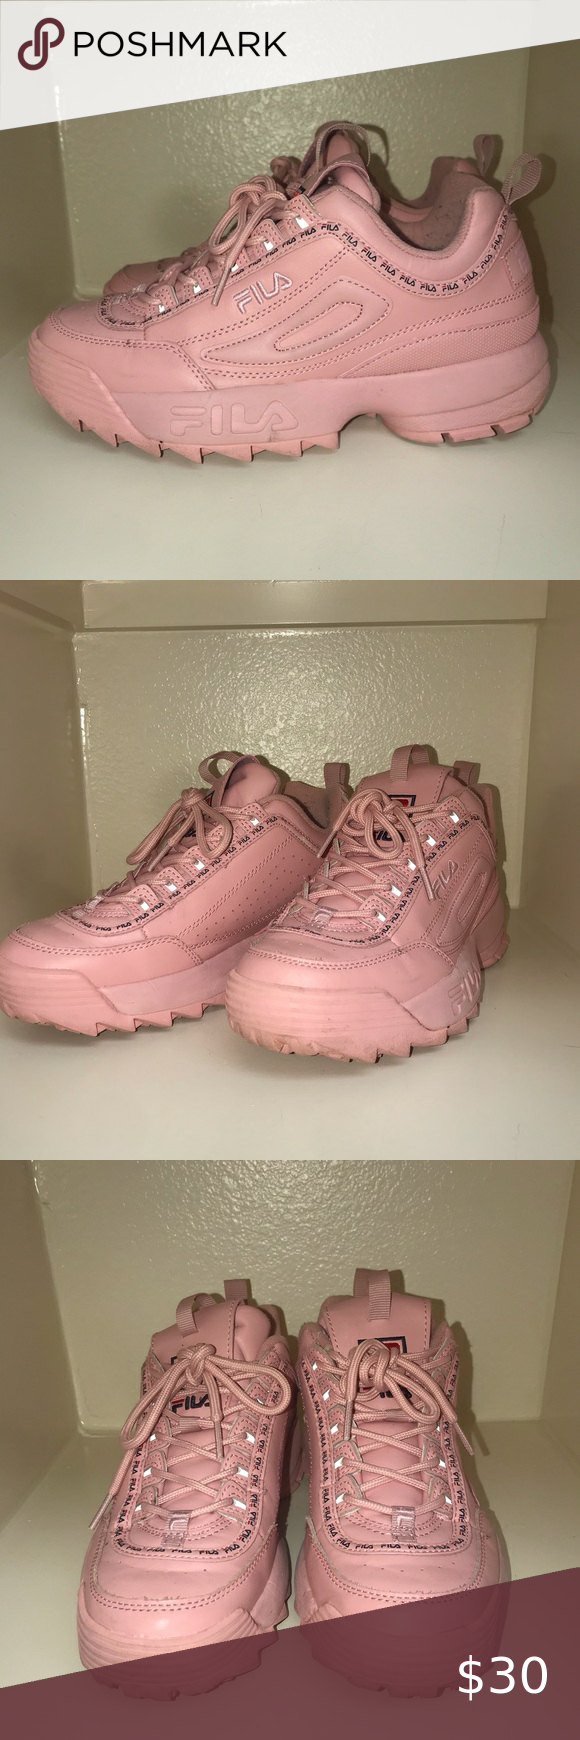 Fila disruptors, Womens shoes sneakers